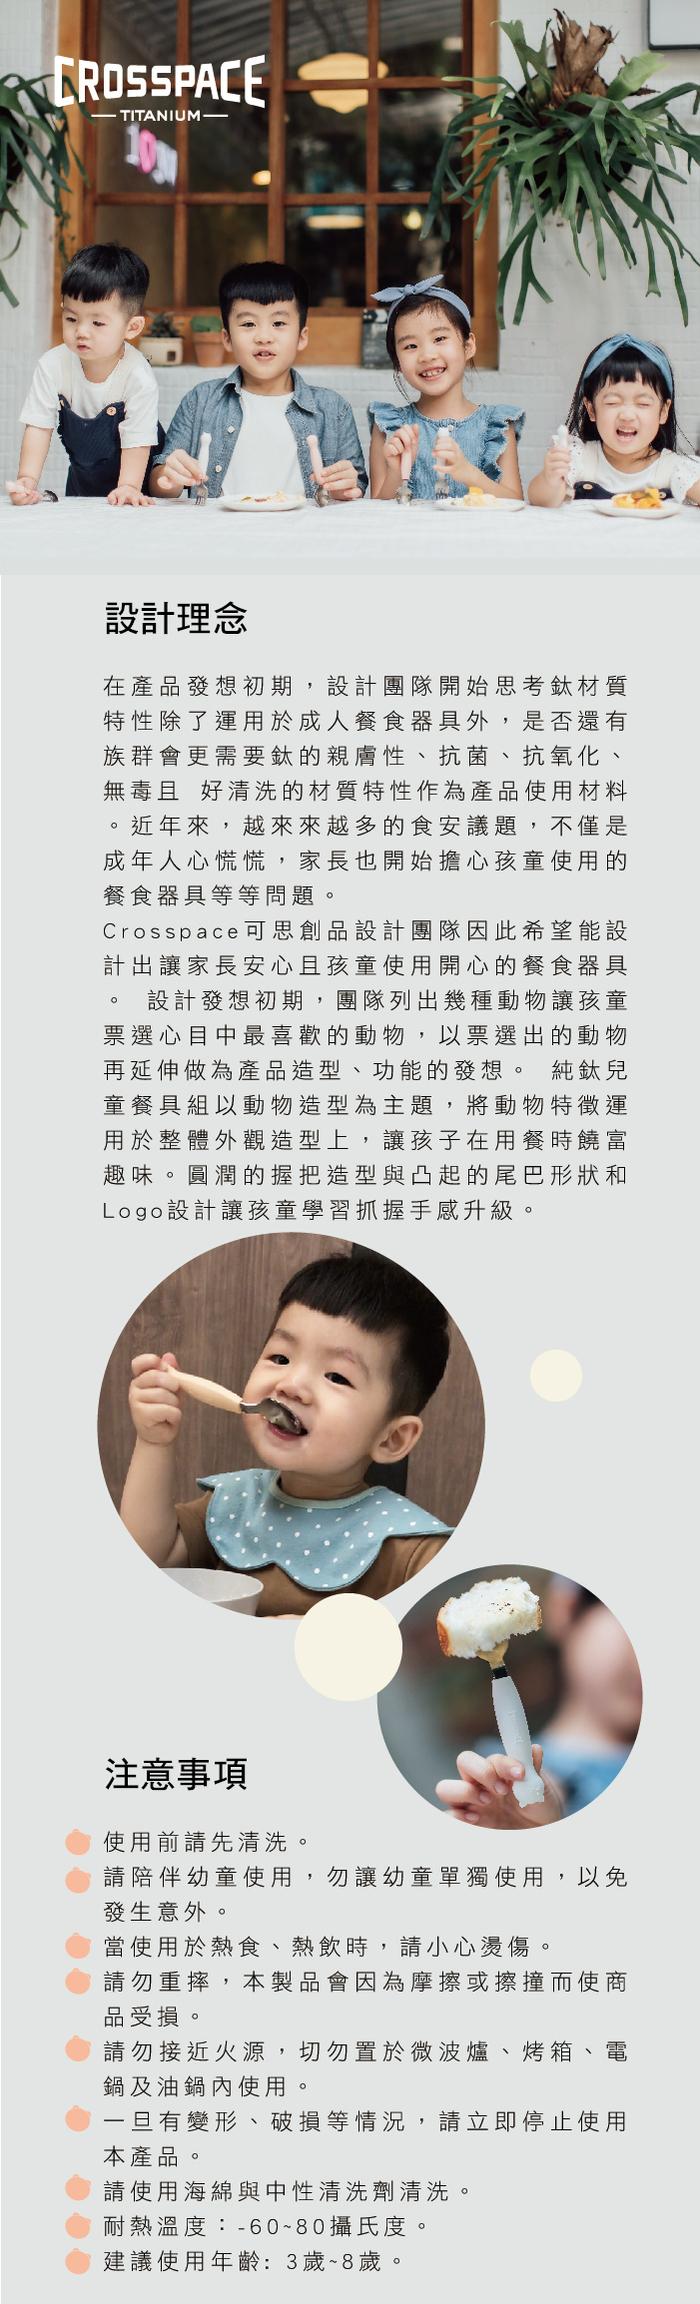 CROSSPACE|純鈦兒童環保餐具組(超值二入組)